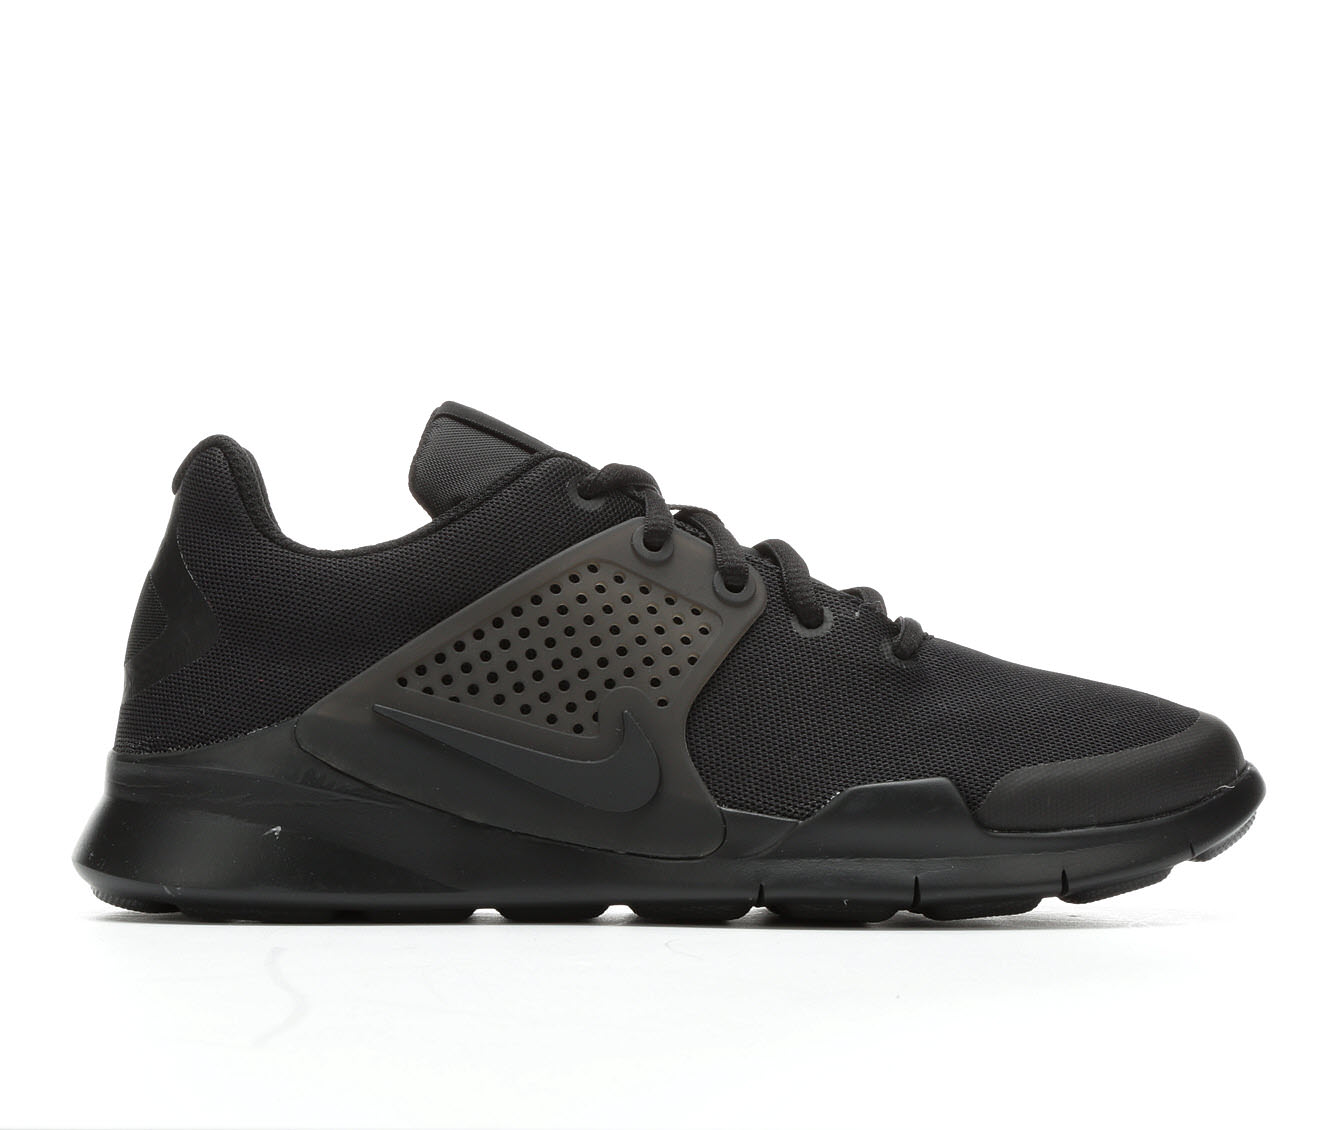 Boys' Nike Arrowz Running Shoes (Black)